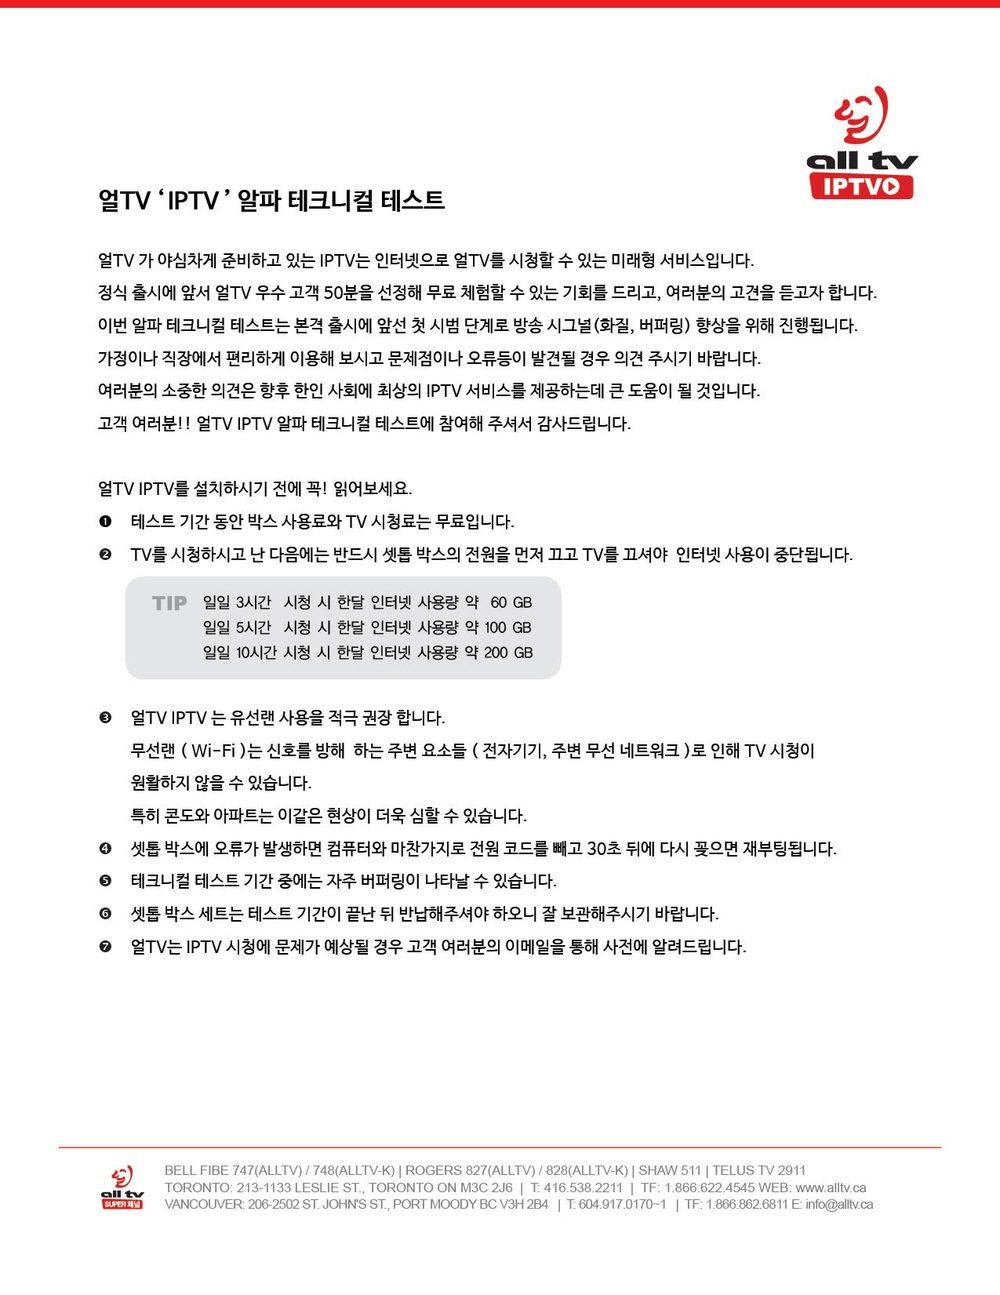 SETUP-instructions-31JUL14-1-lowres.jpg